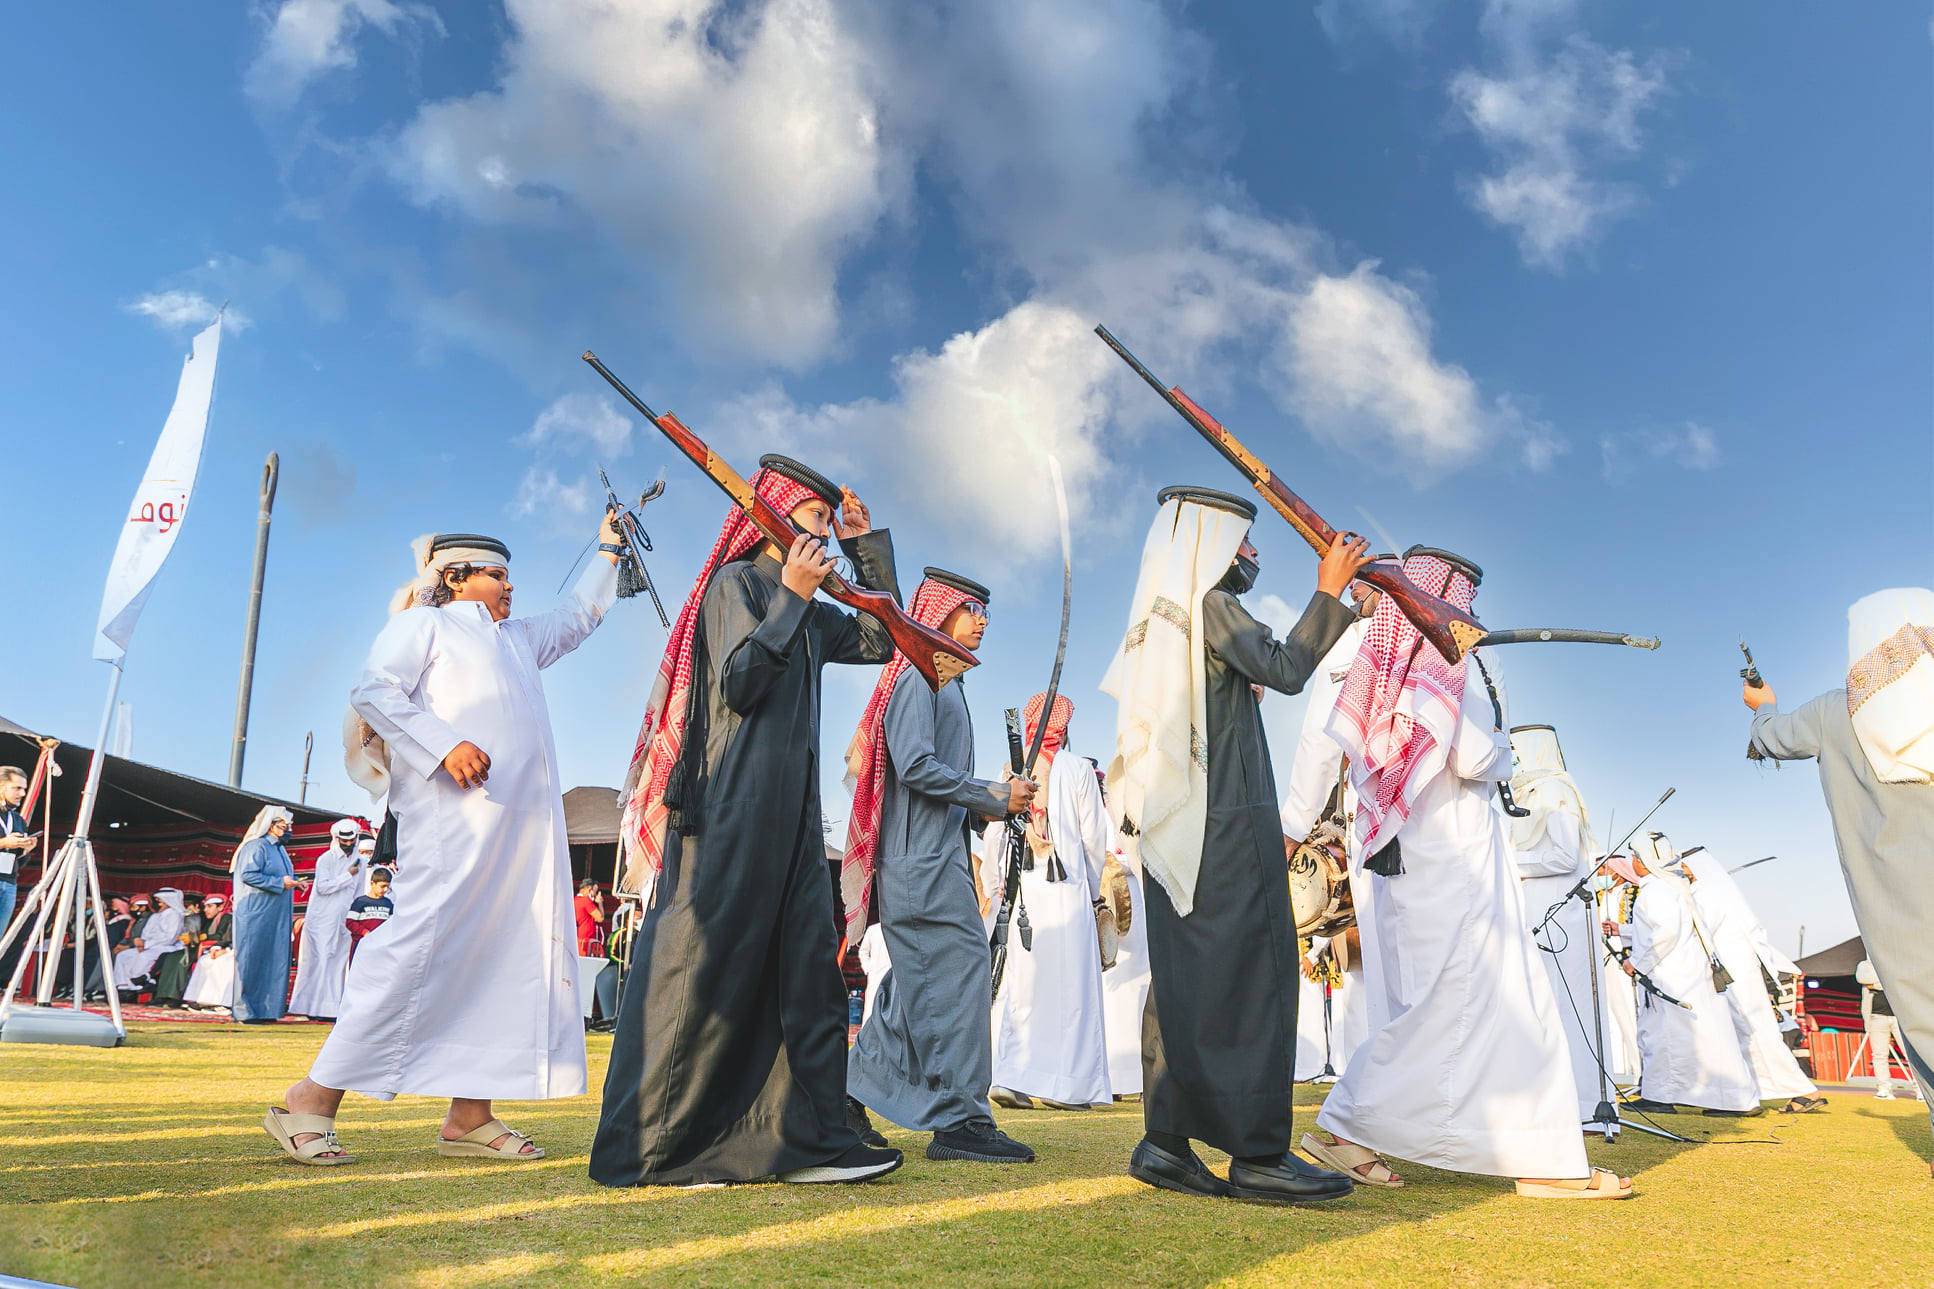 Al Khor Carnival: A destination for entertainment and fun begins